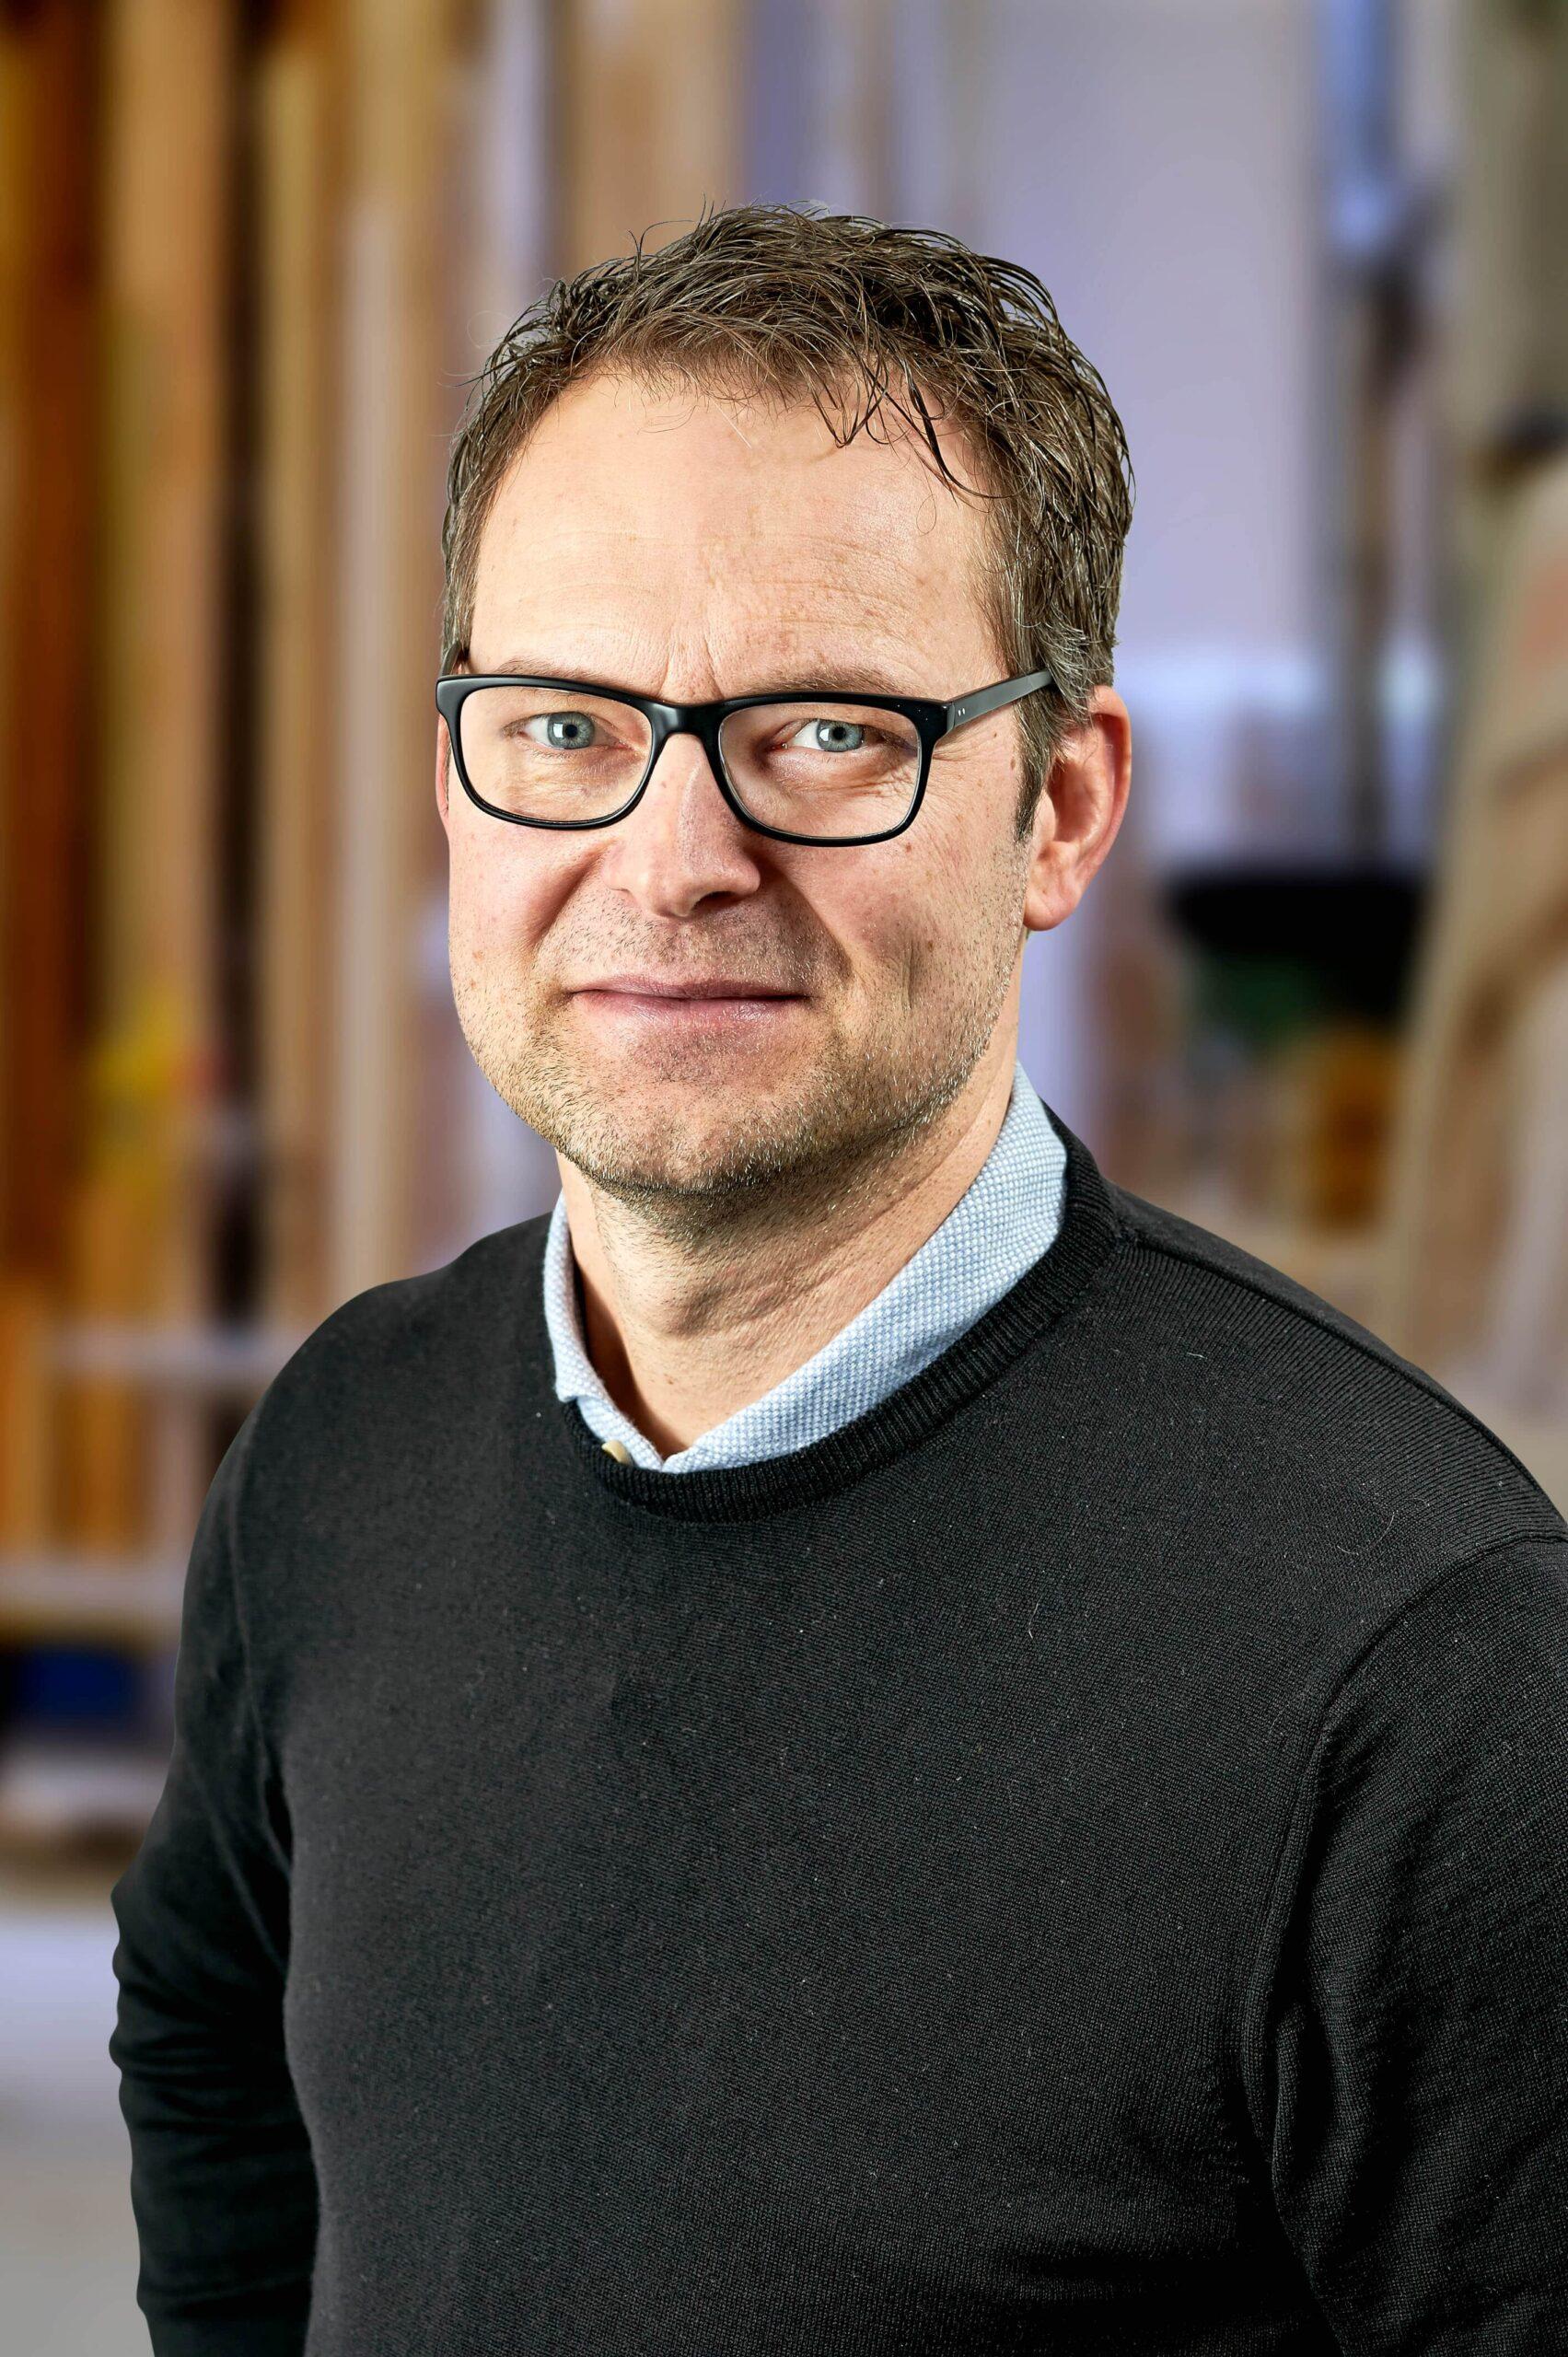 Simon S. Hansen